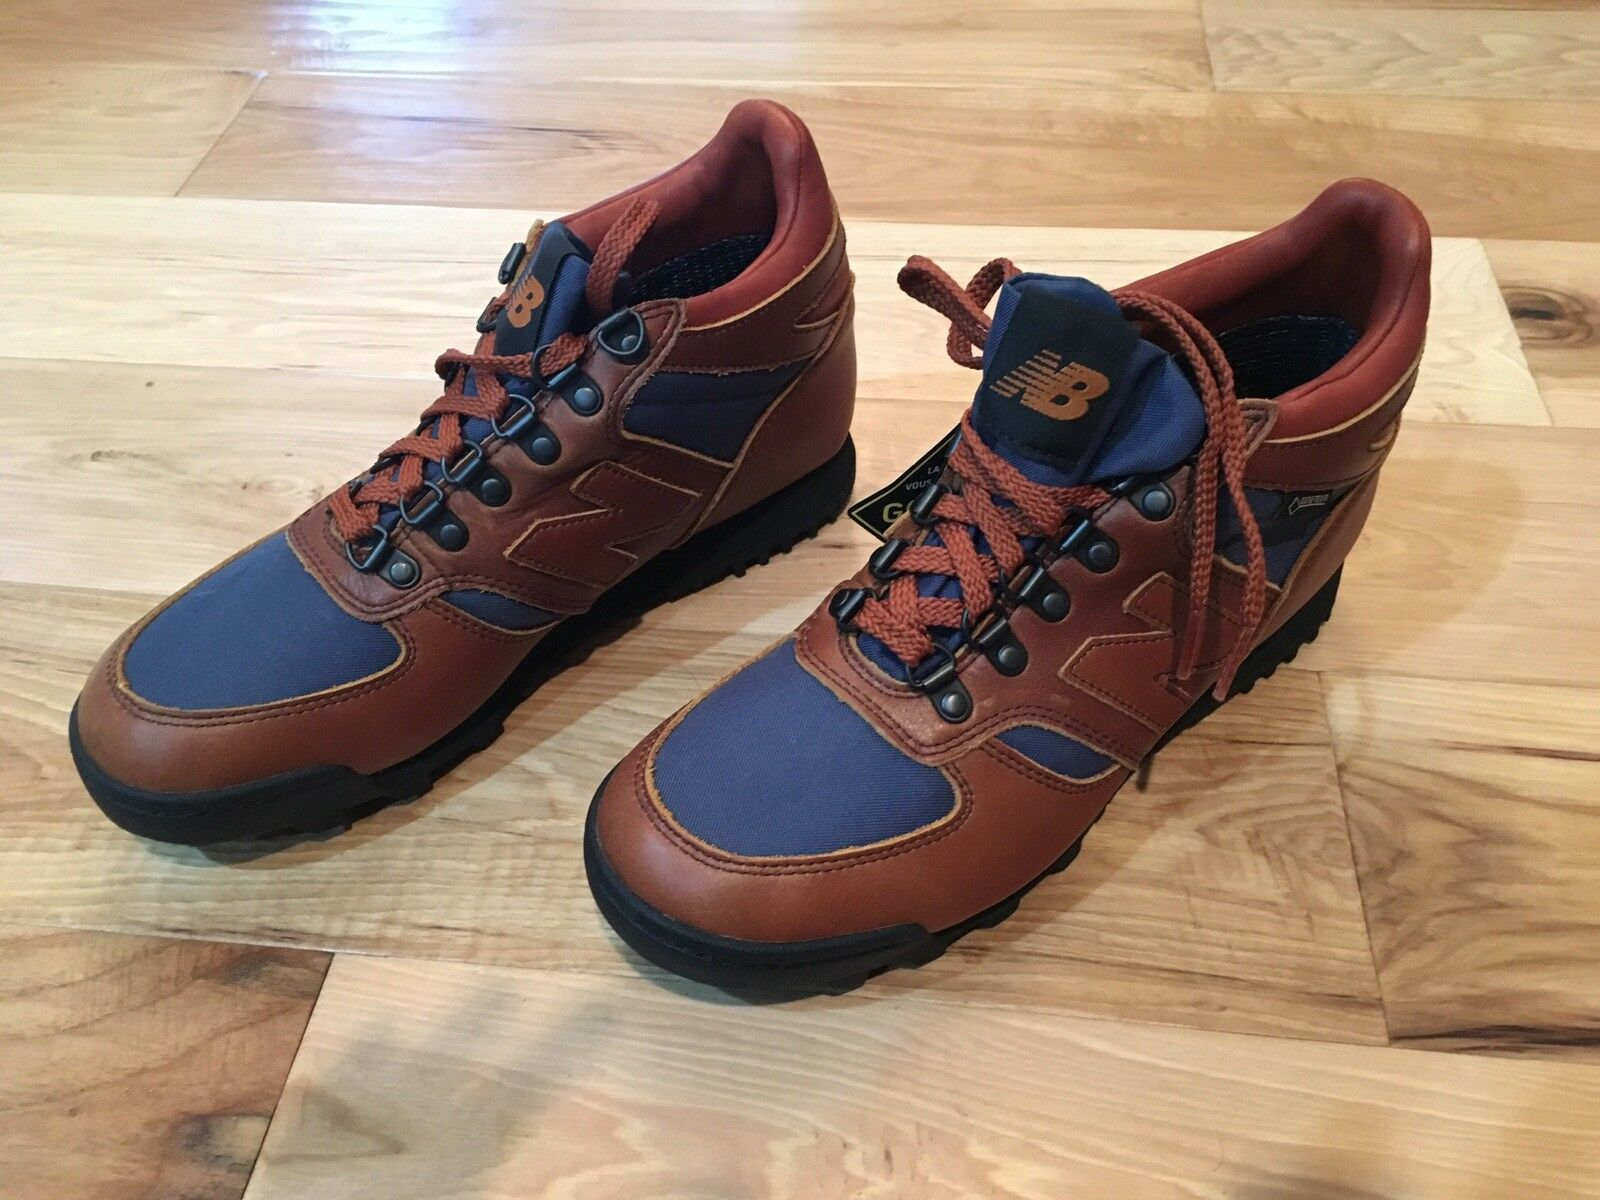 New Balance Rainier Remastered Hiking shoes - HLRAINOG 7 Gore-tex Trail Boots